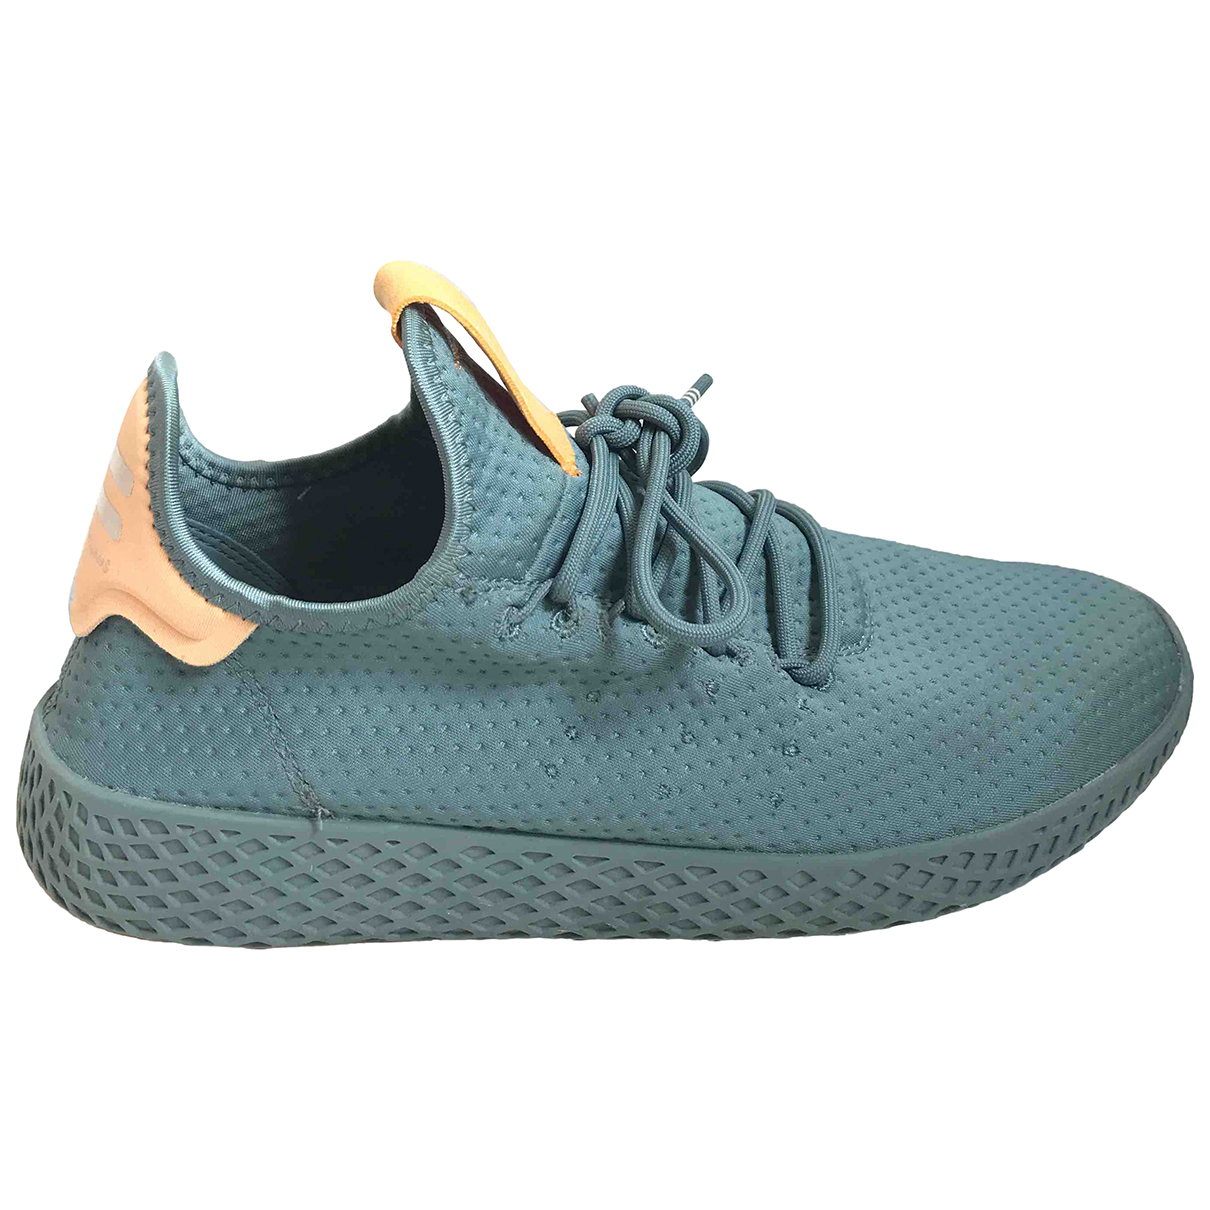 Adidas N Green Cloth Trainers for Men 41.5 EU